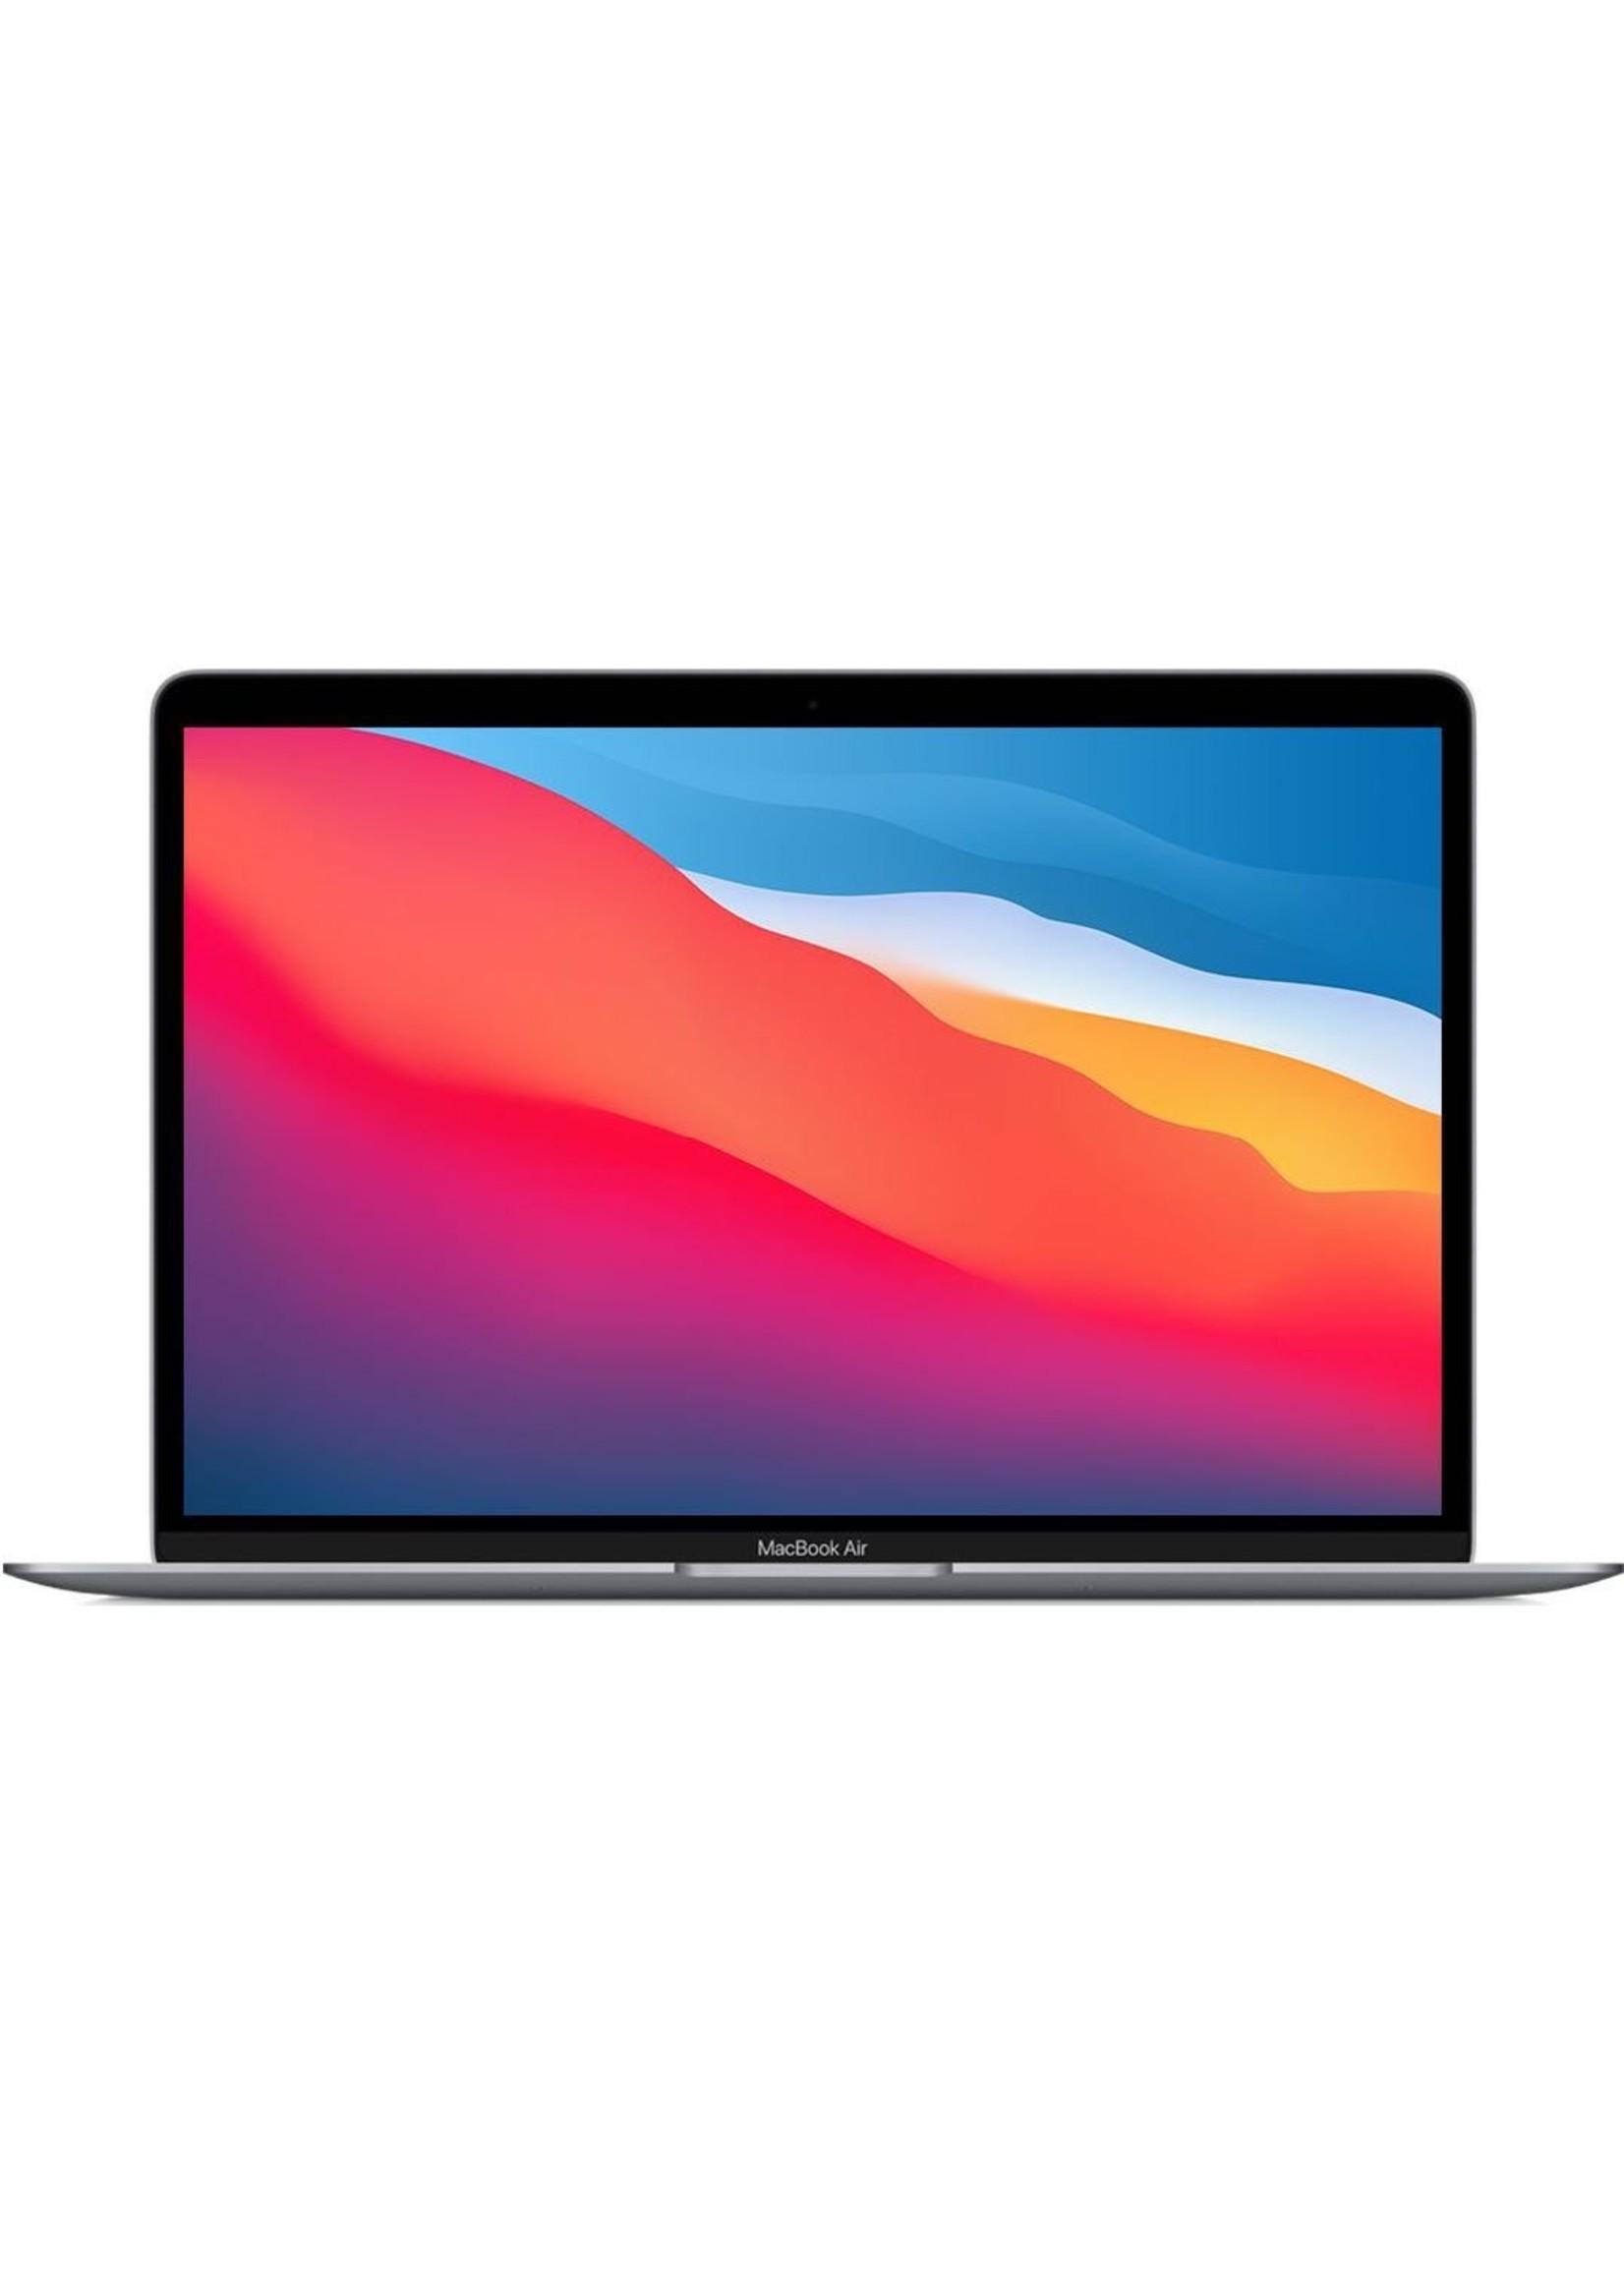 Apple MacBook Air 13-inch 256GB Space Gray